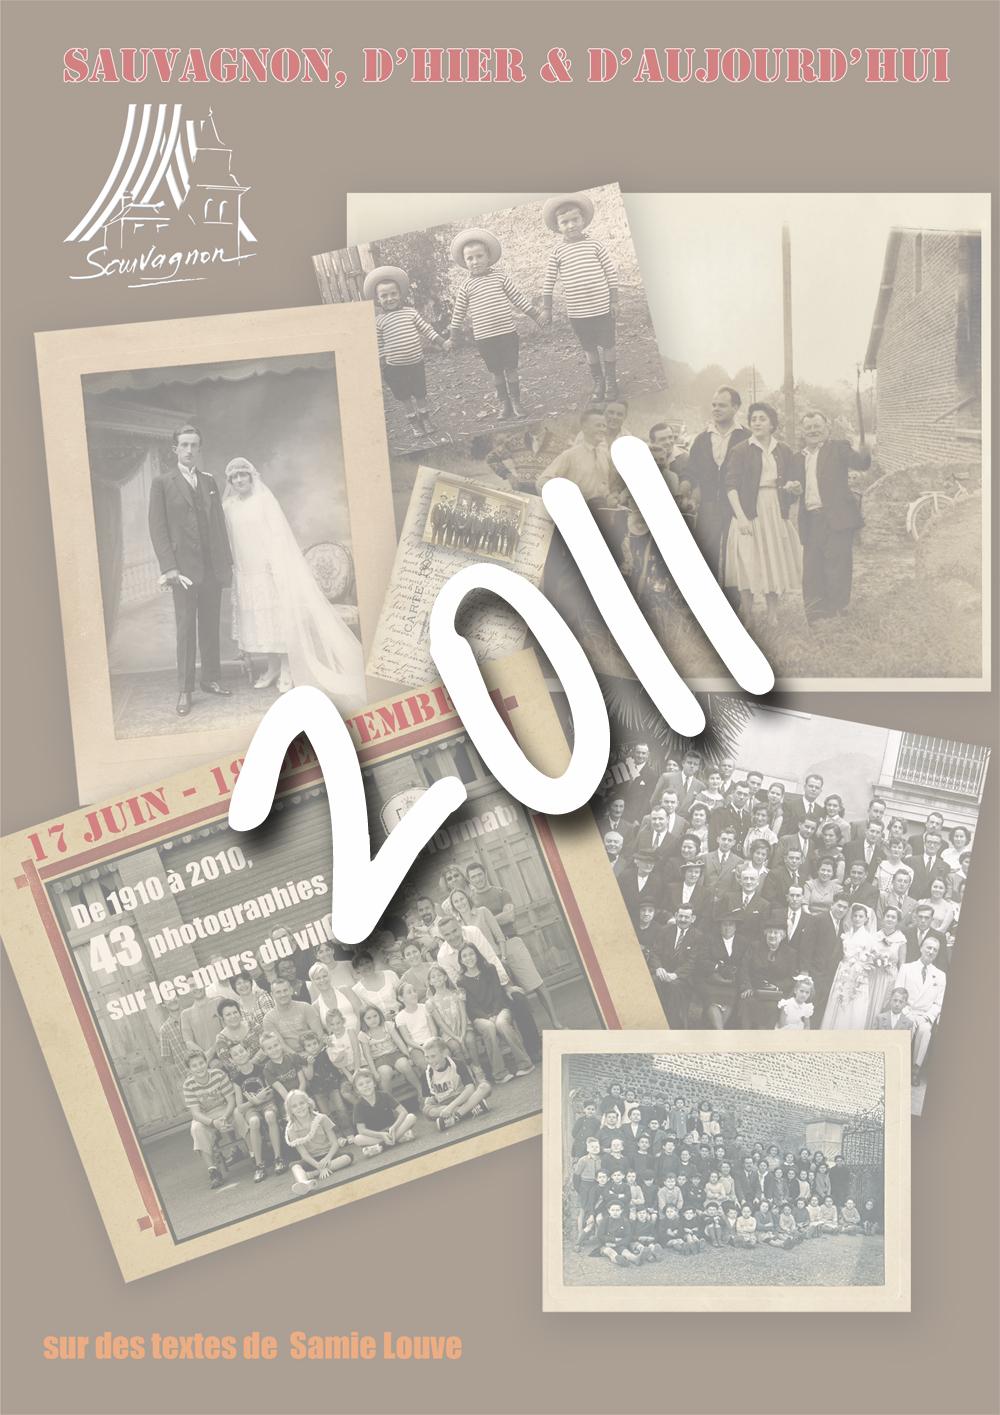 Sauvagnon patrimoine 2011